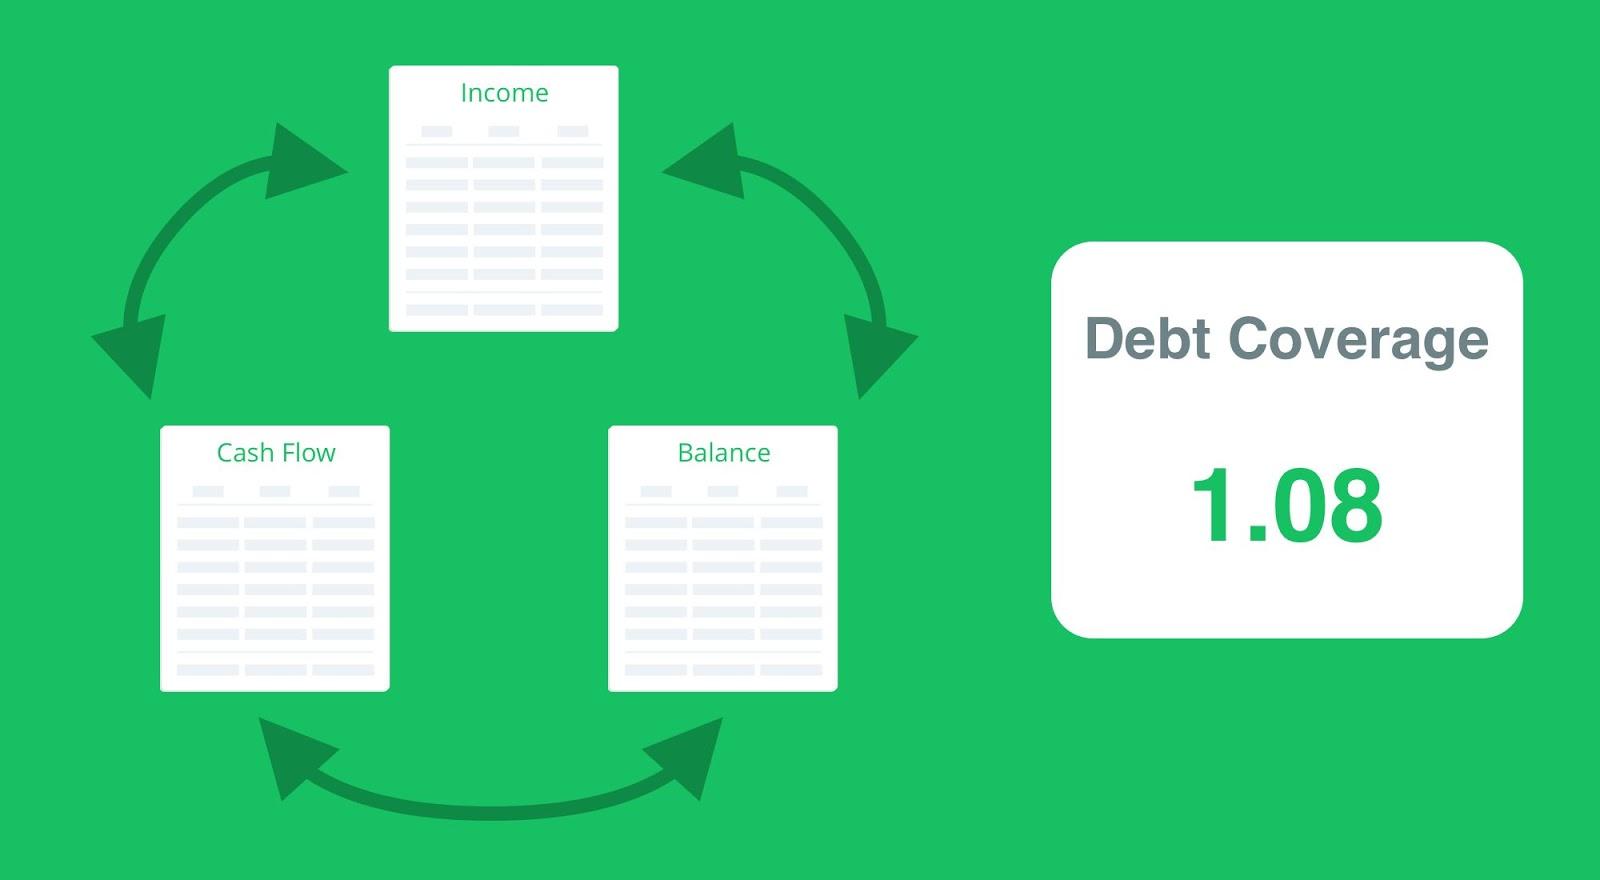 debt-coverage-ratio-example